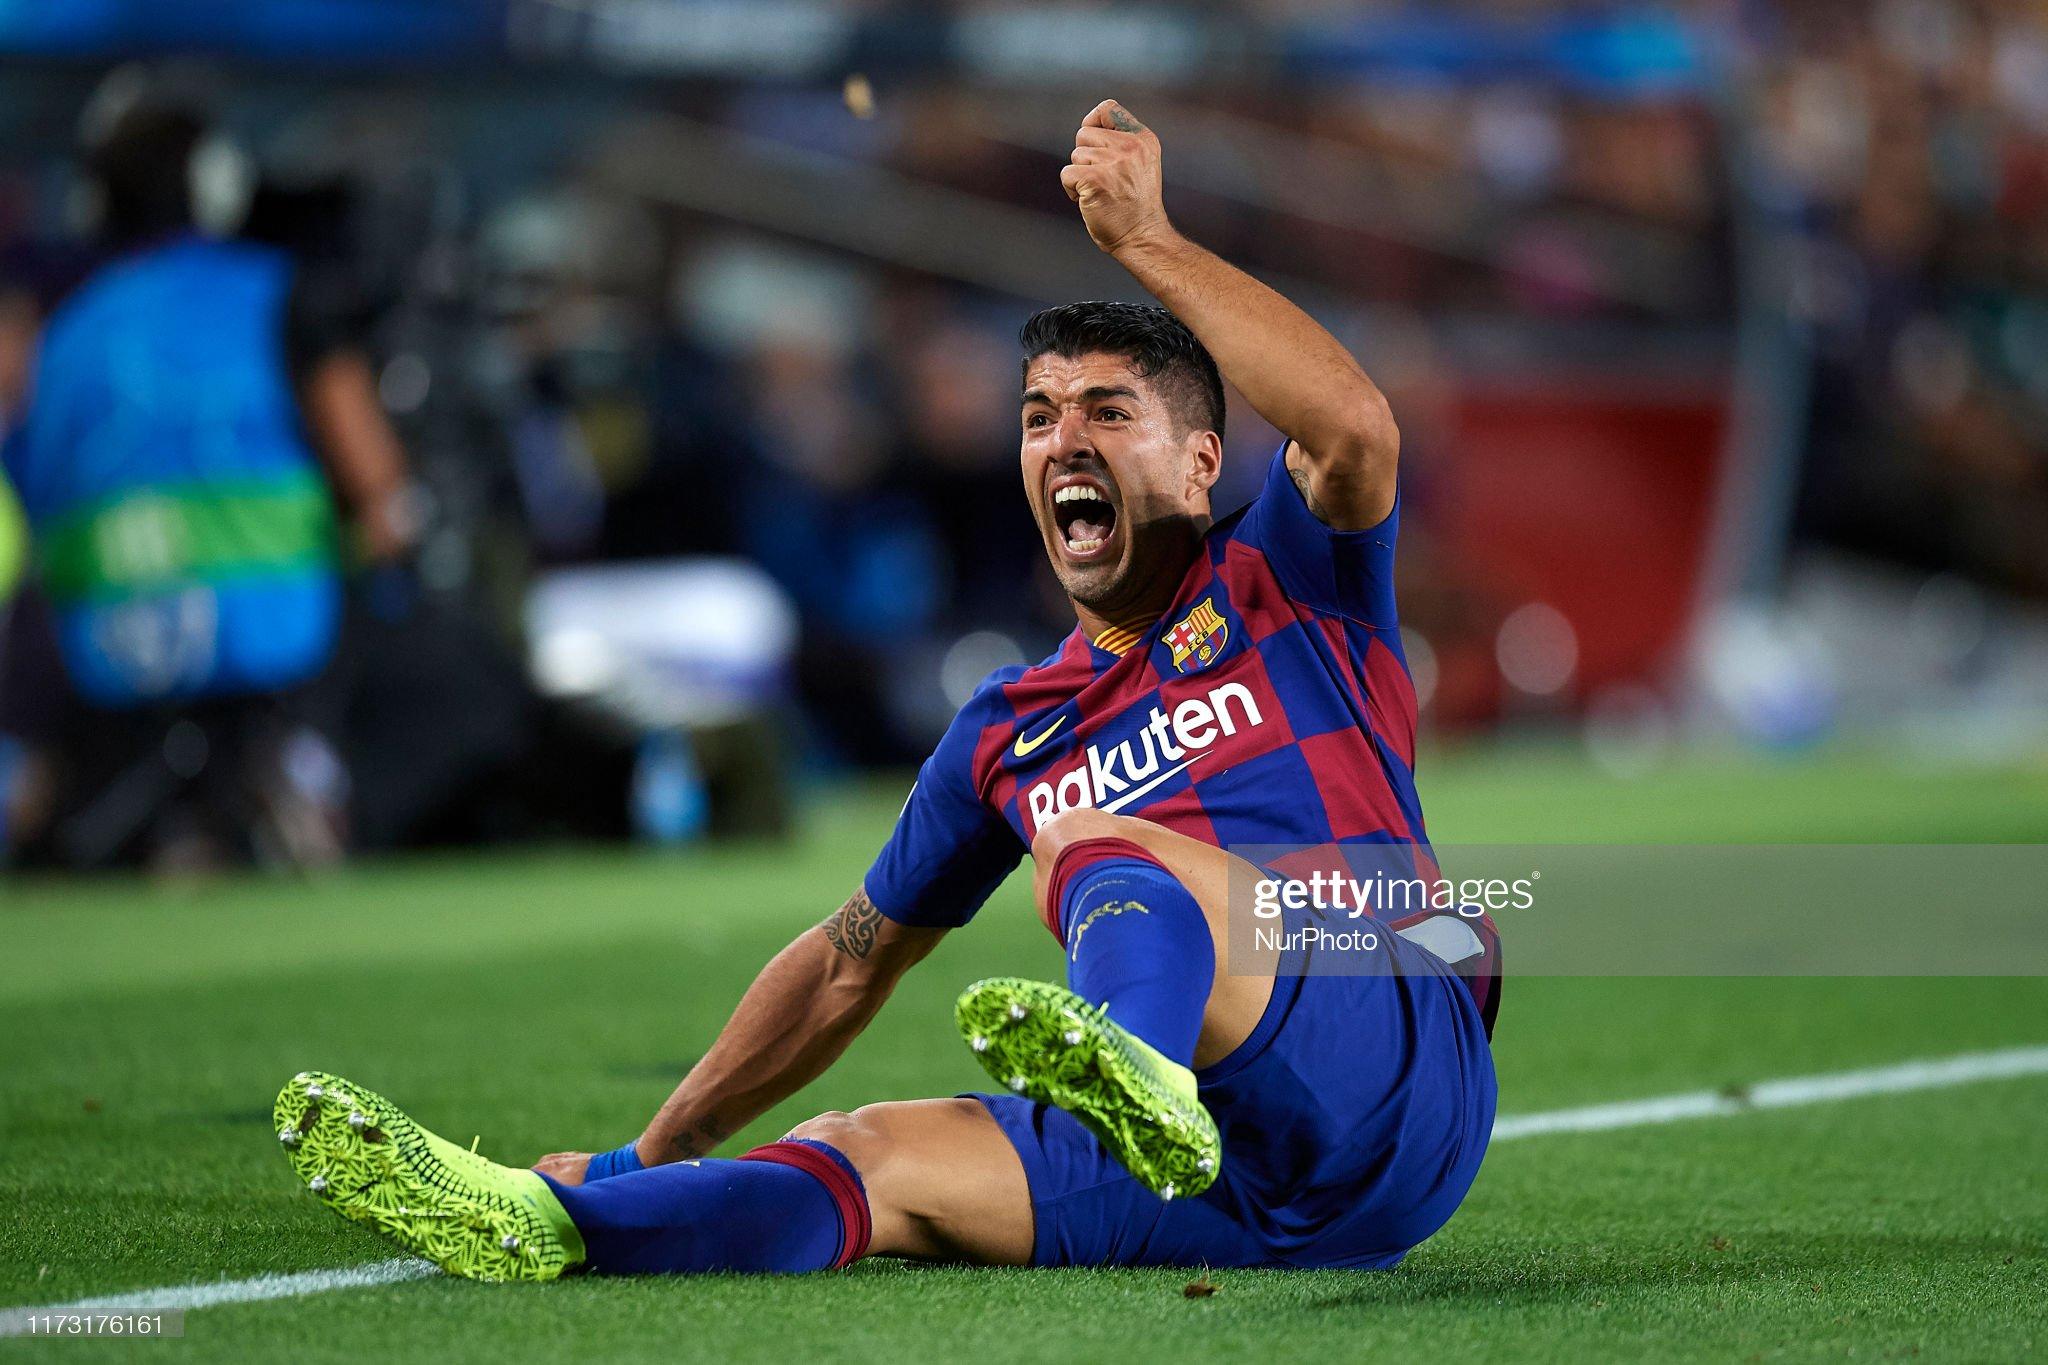 صور مباراة : برشلونة - إنتر 2-1 ( 02-10-2019 )  Luis-suarez-of-barcelona-protest-during-the-uefa-champions-league-f-picture-id1173176161?s=2048x2048